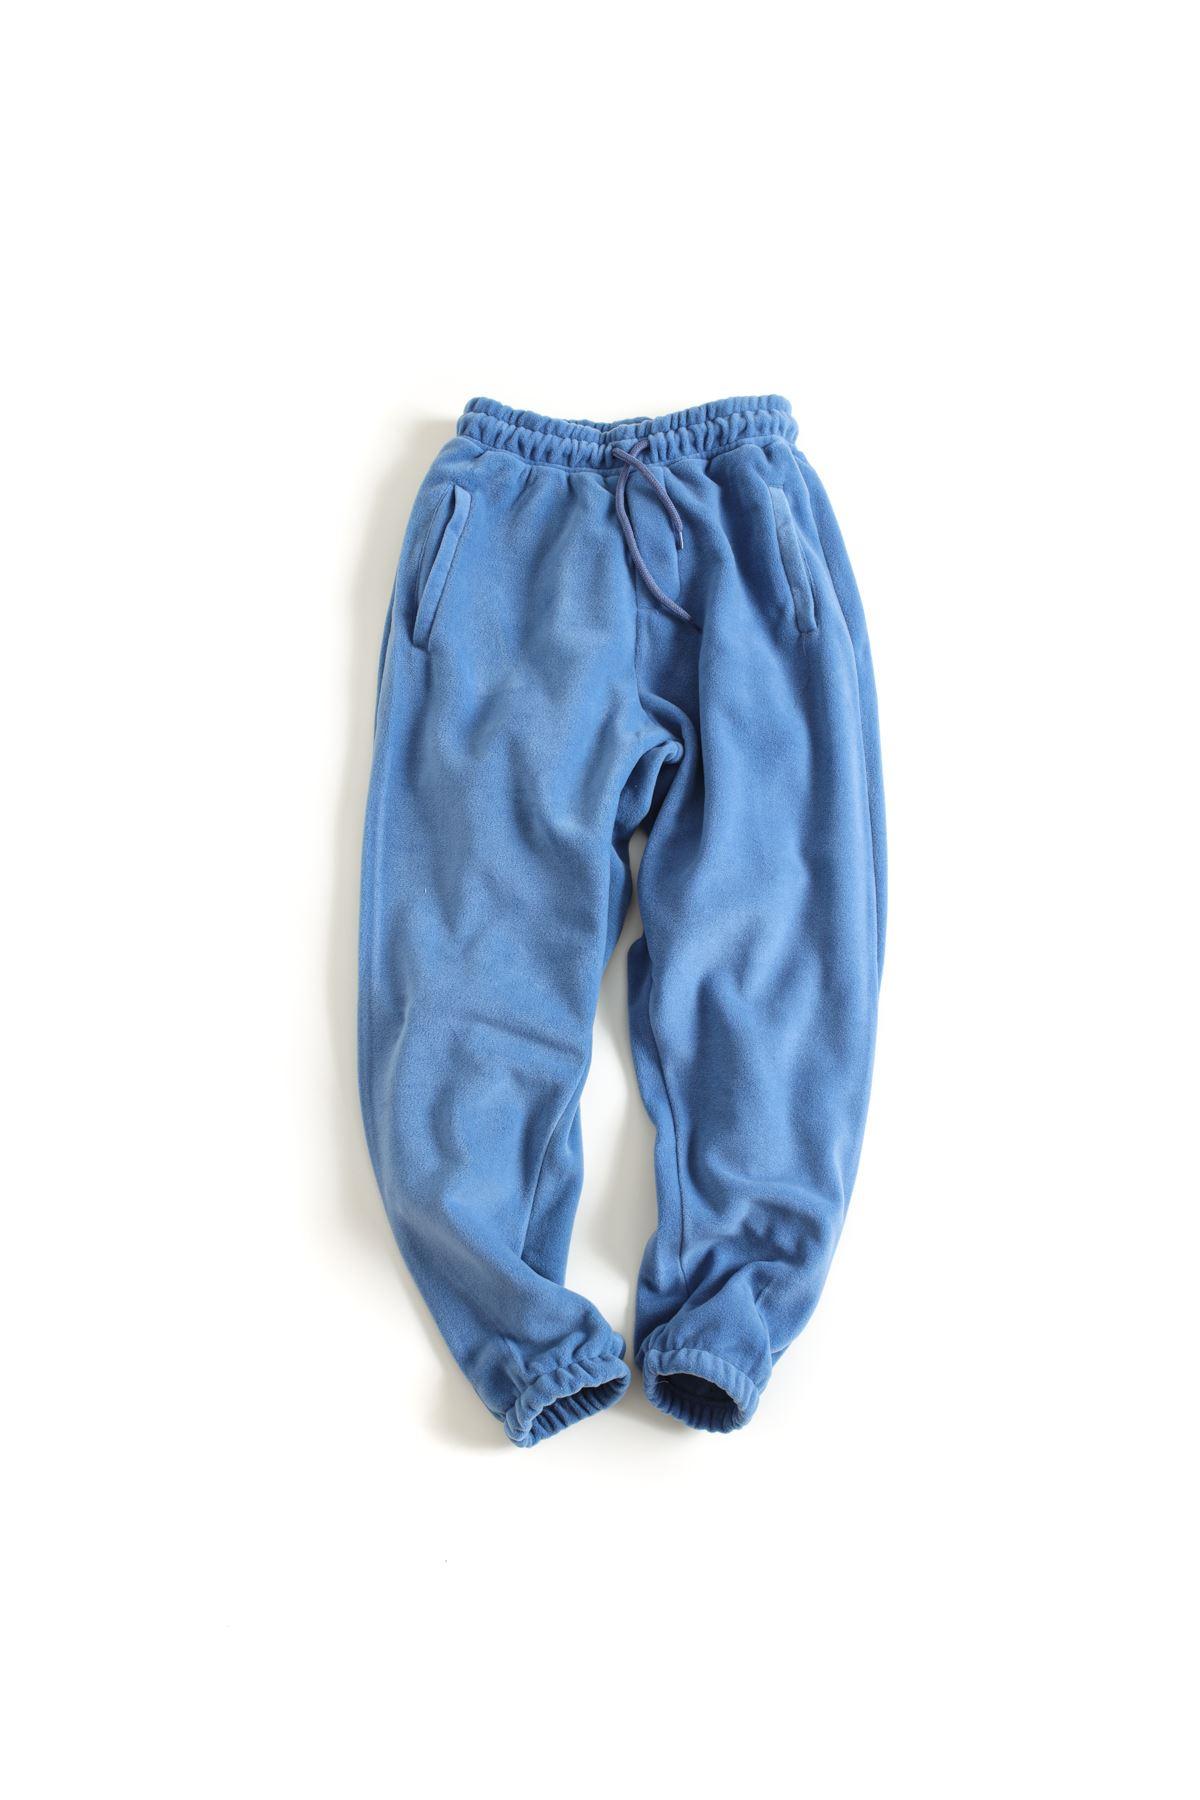 Mavi Polar Lastikli Paçalı Jogger Pantolon